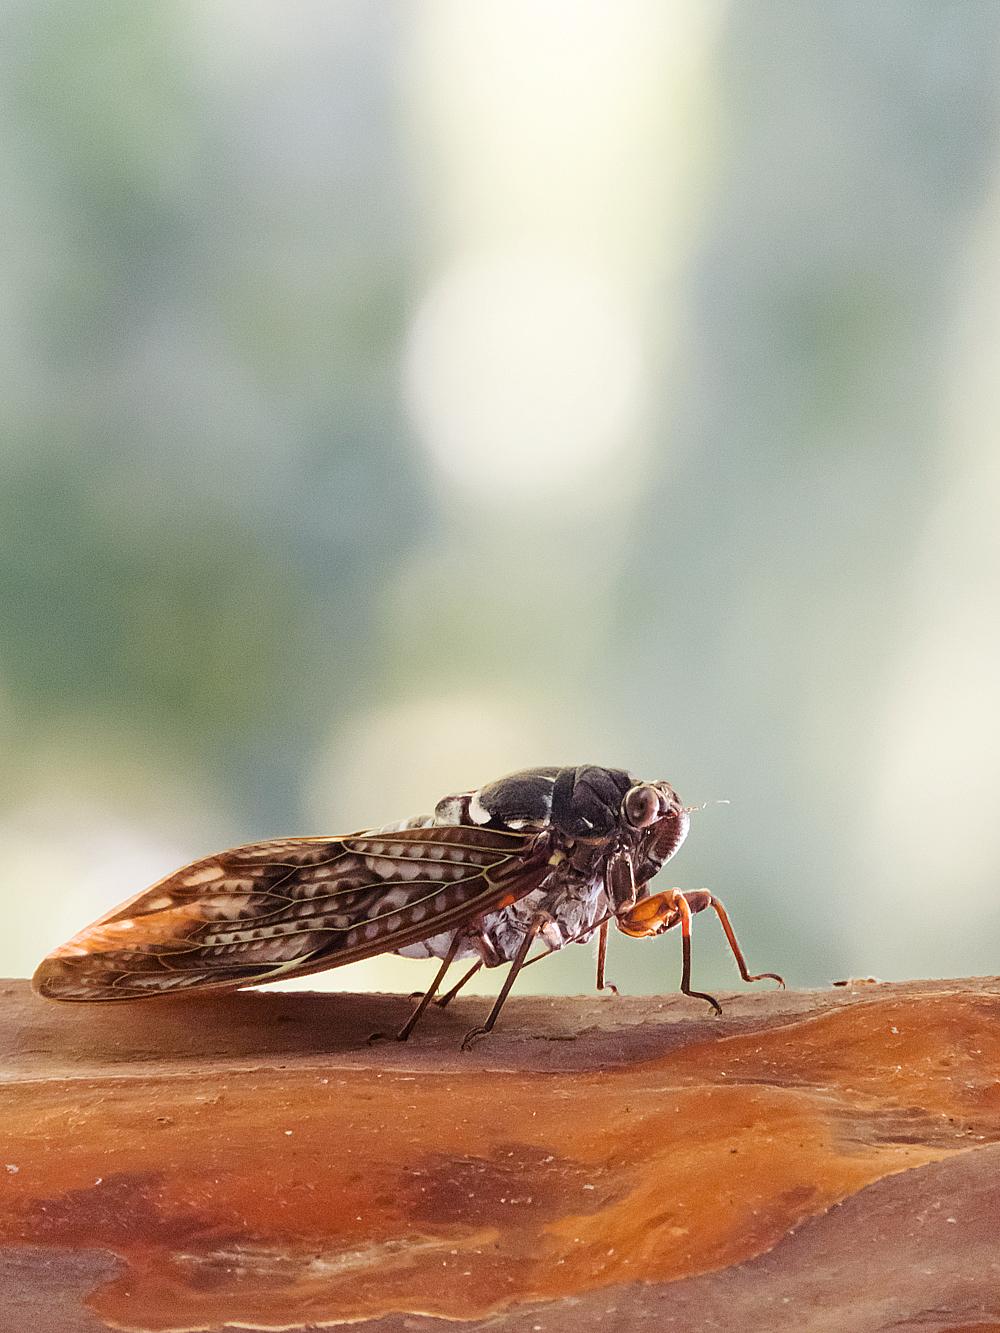 COOLPIX B700 昆虫撮影 アブラゼミ 画像